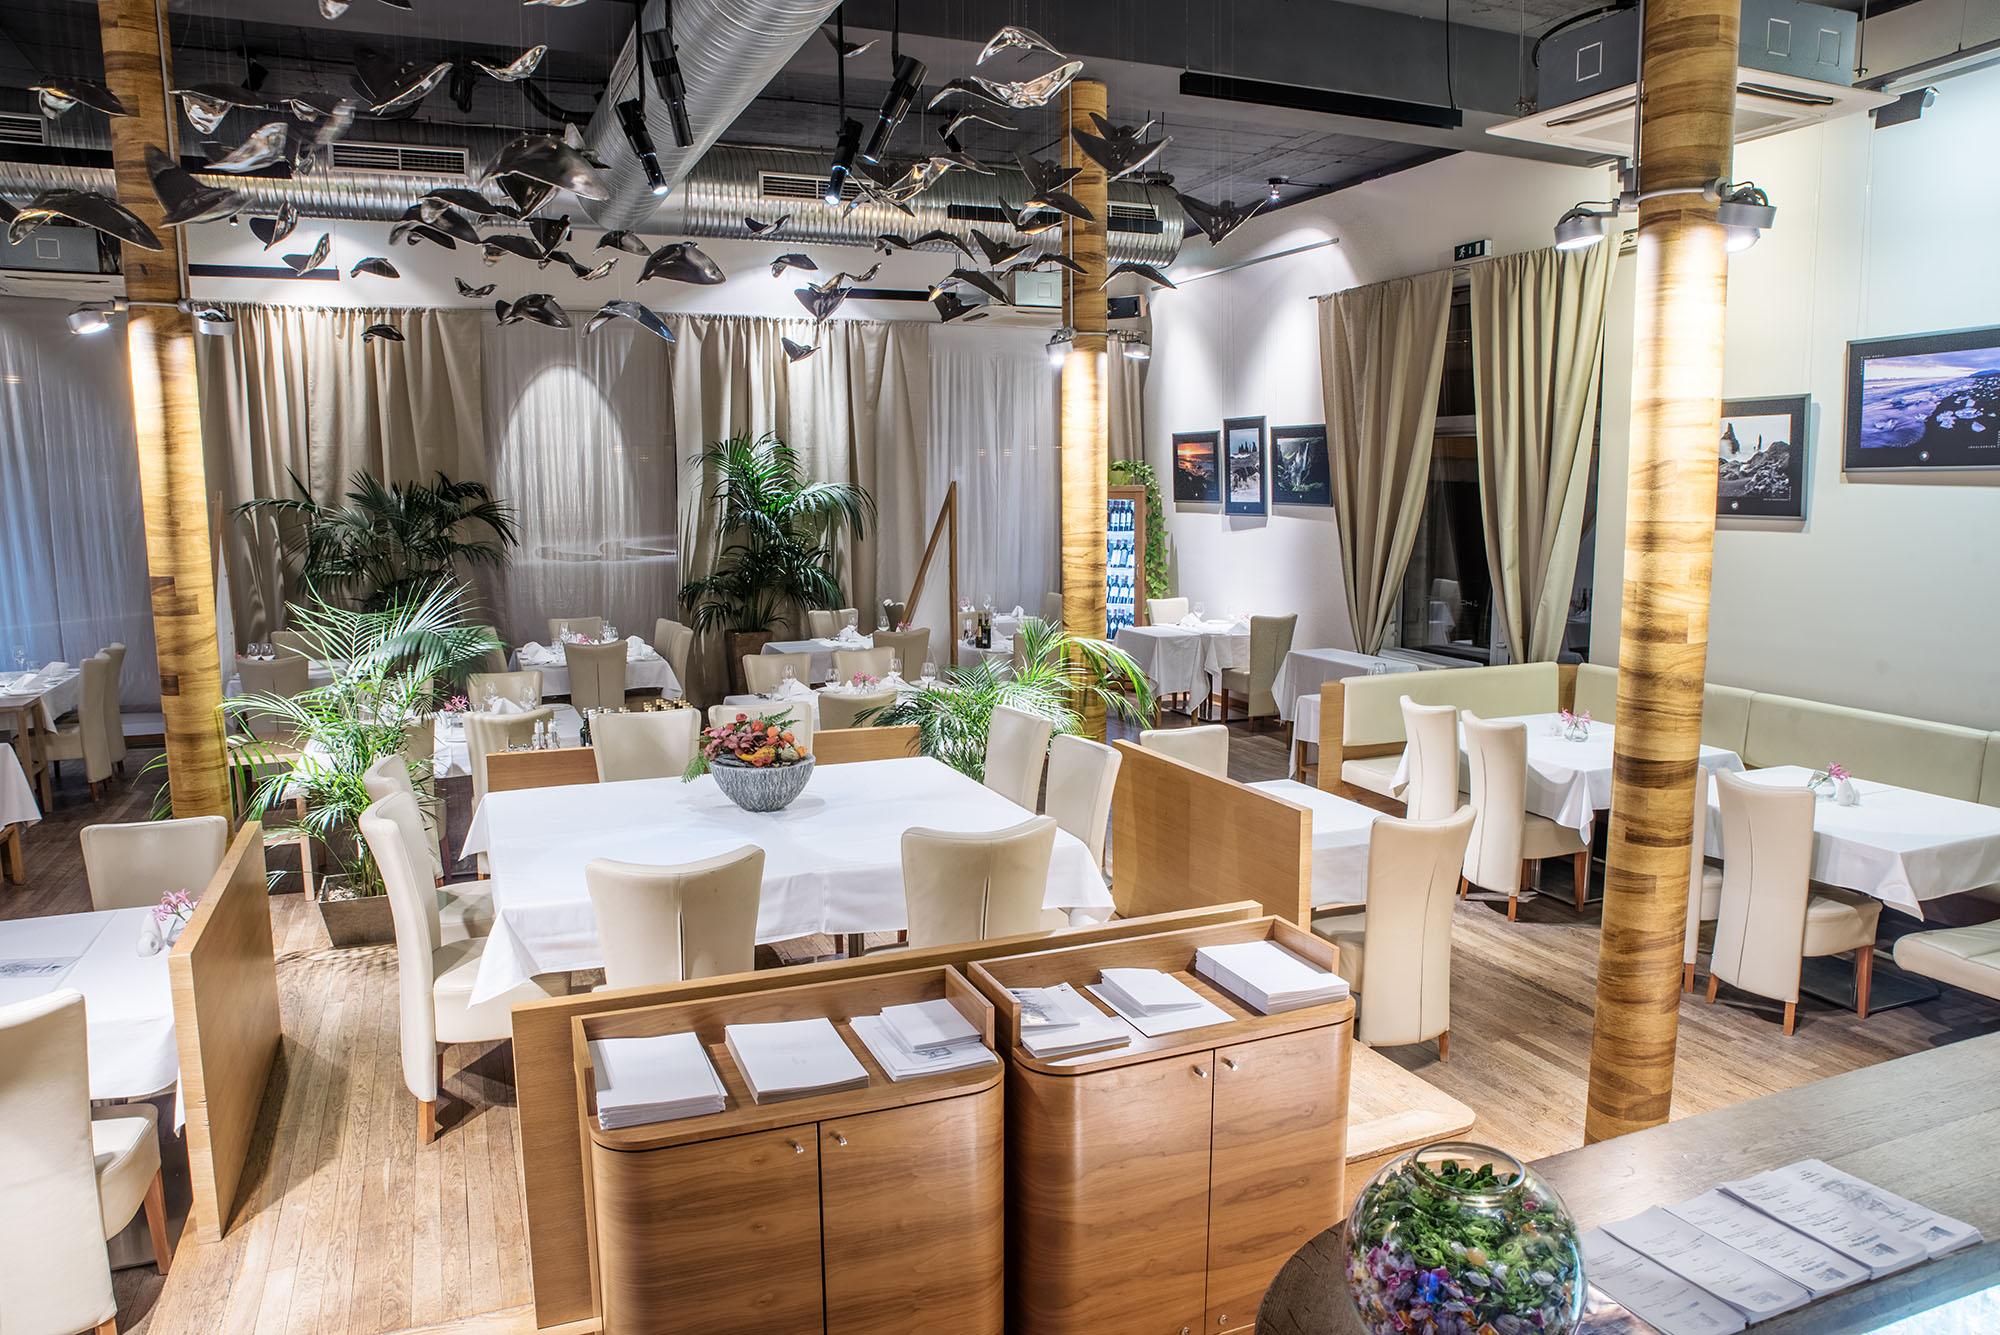 Restaurant design hotel noem arch brno for Design hotel noem arch